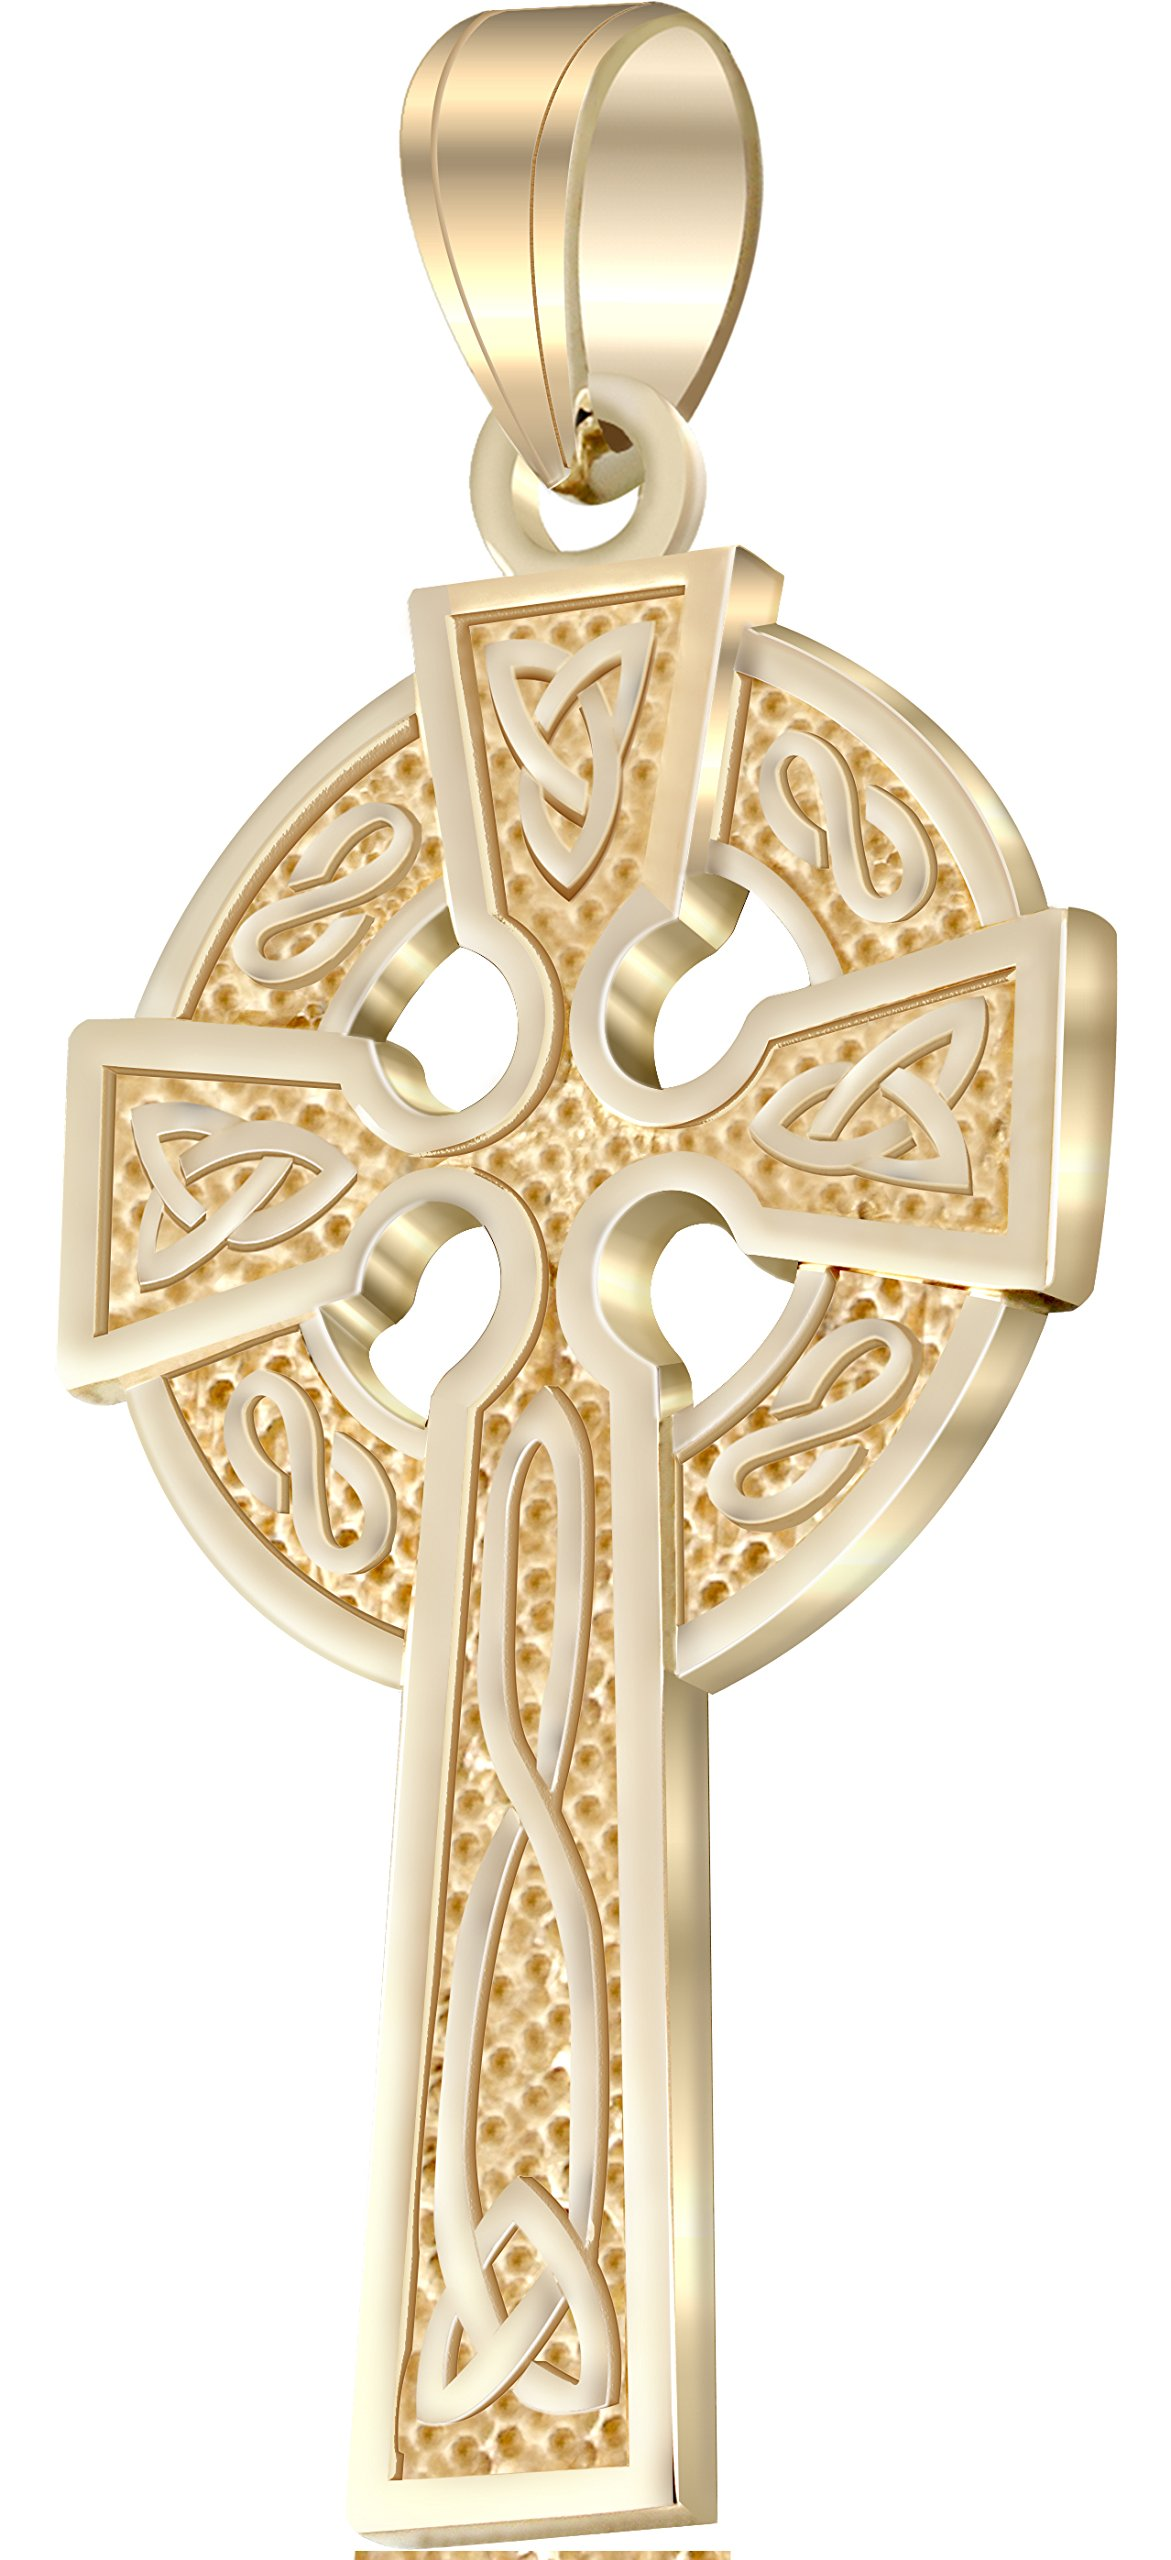 US Jewels And Gems Men's 1.625in 14k Yellow Gold Irish Celtic Knot Cross Pendant